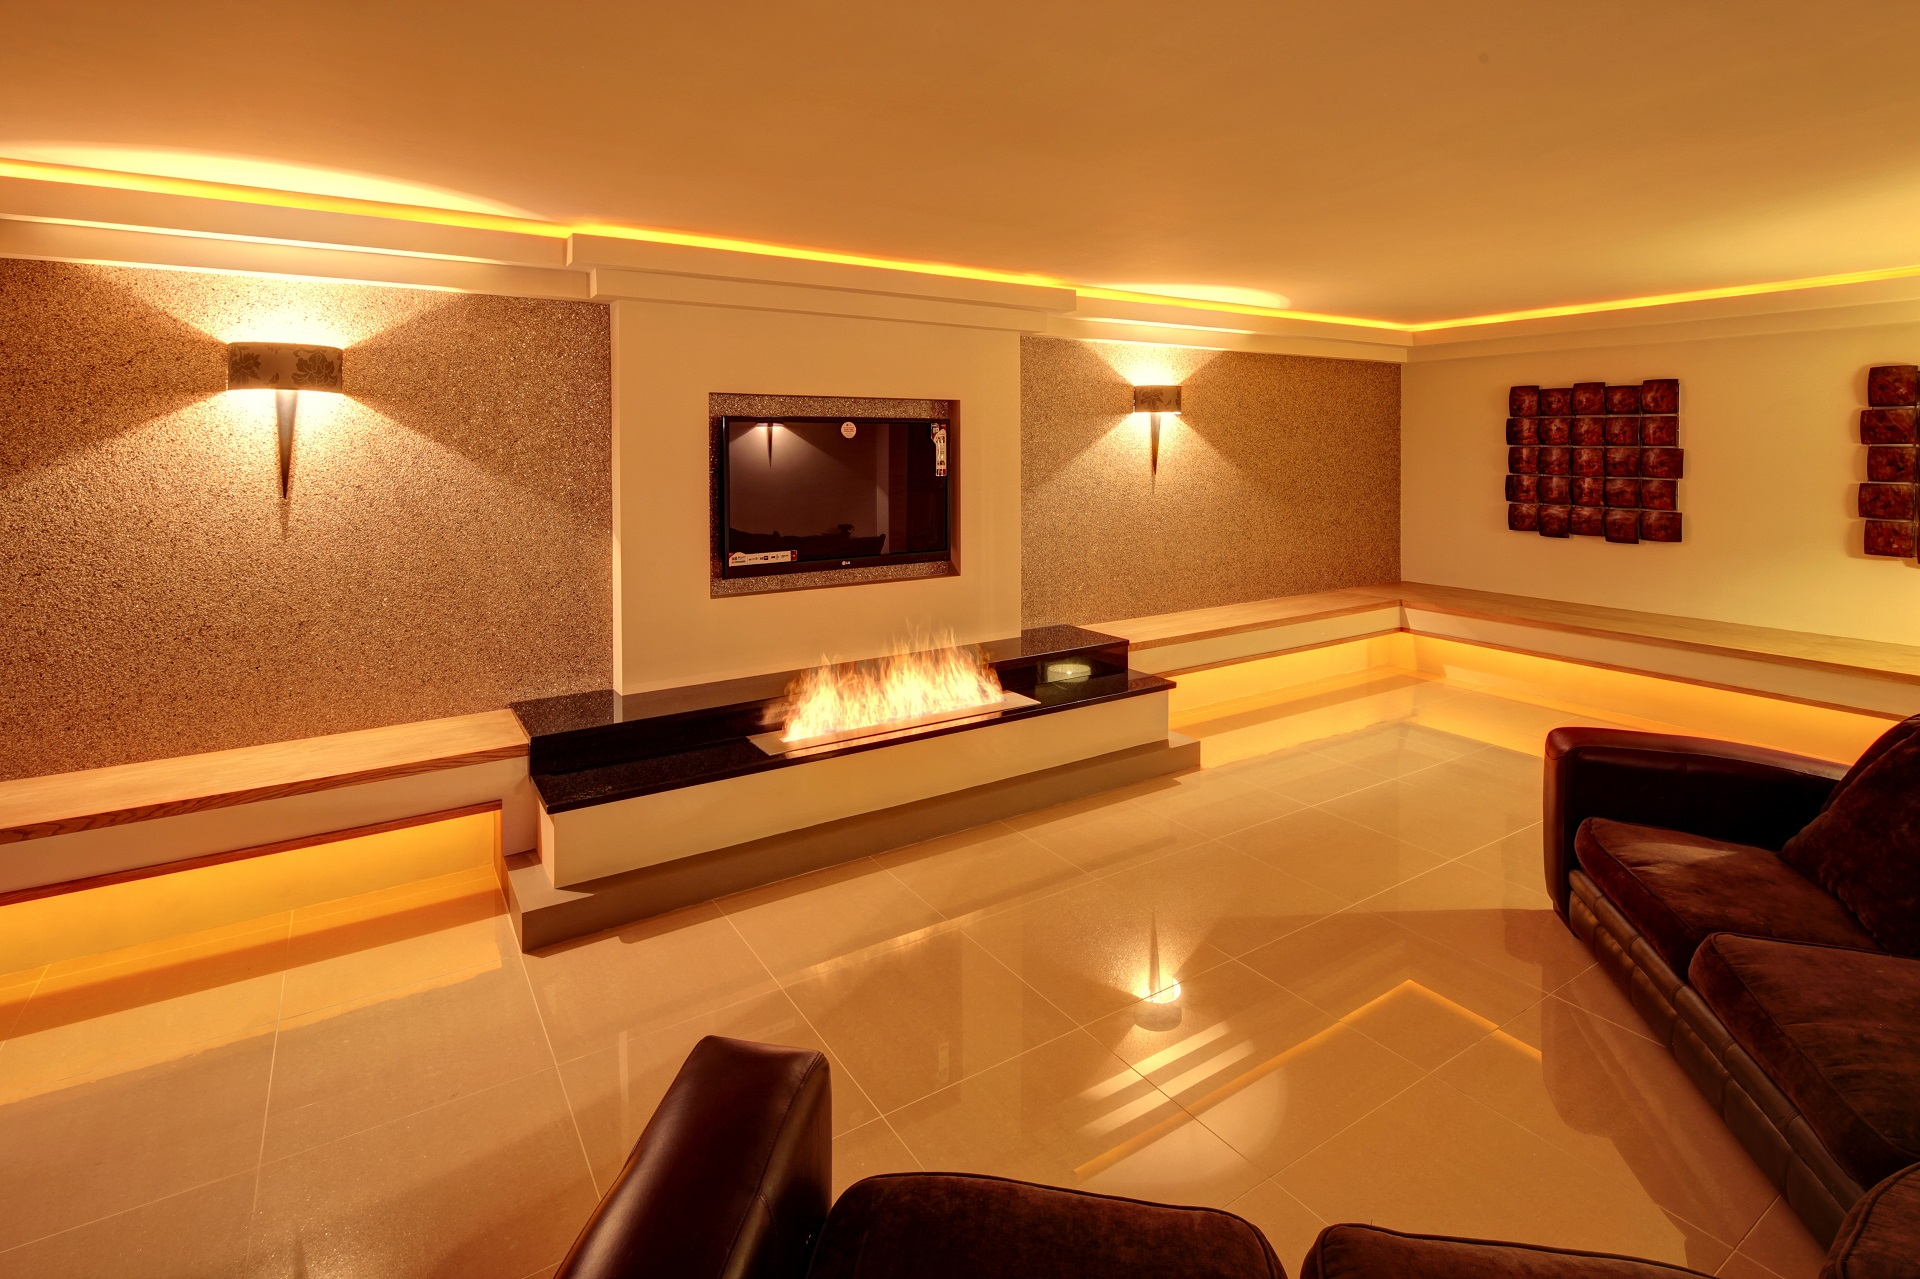 designer living room, shiny tiled floor, gold leaf wallpaper, luxury interior